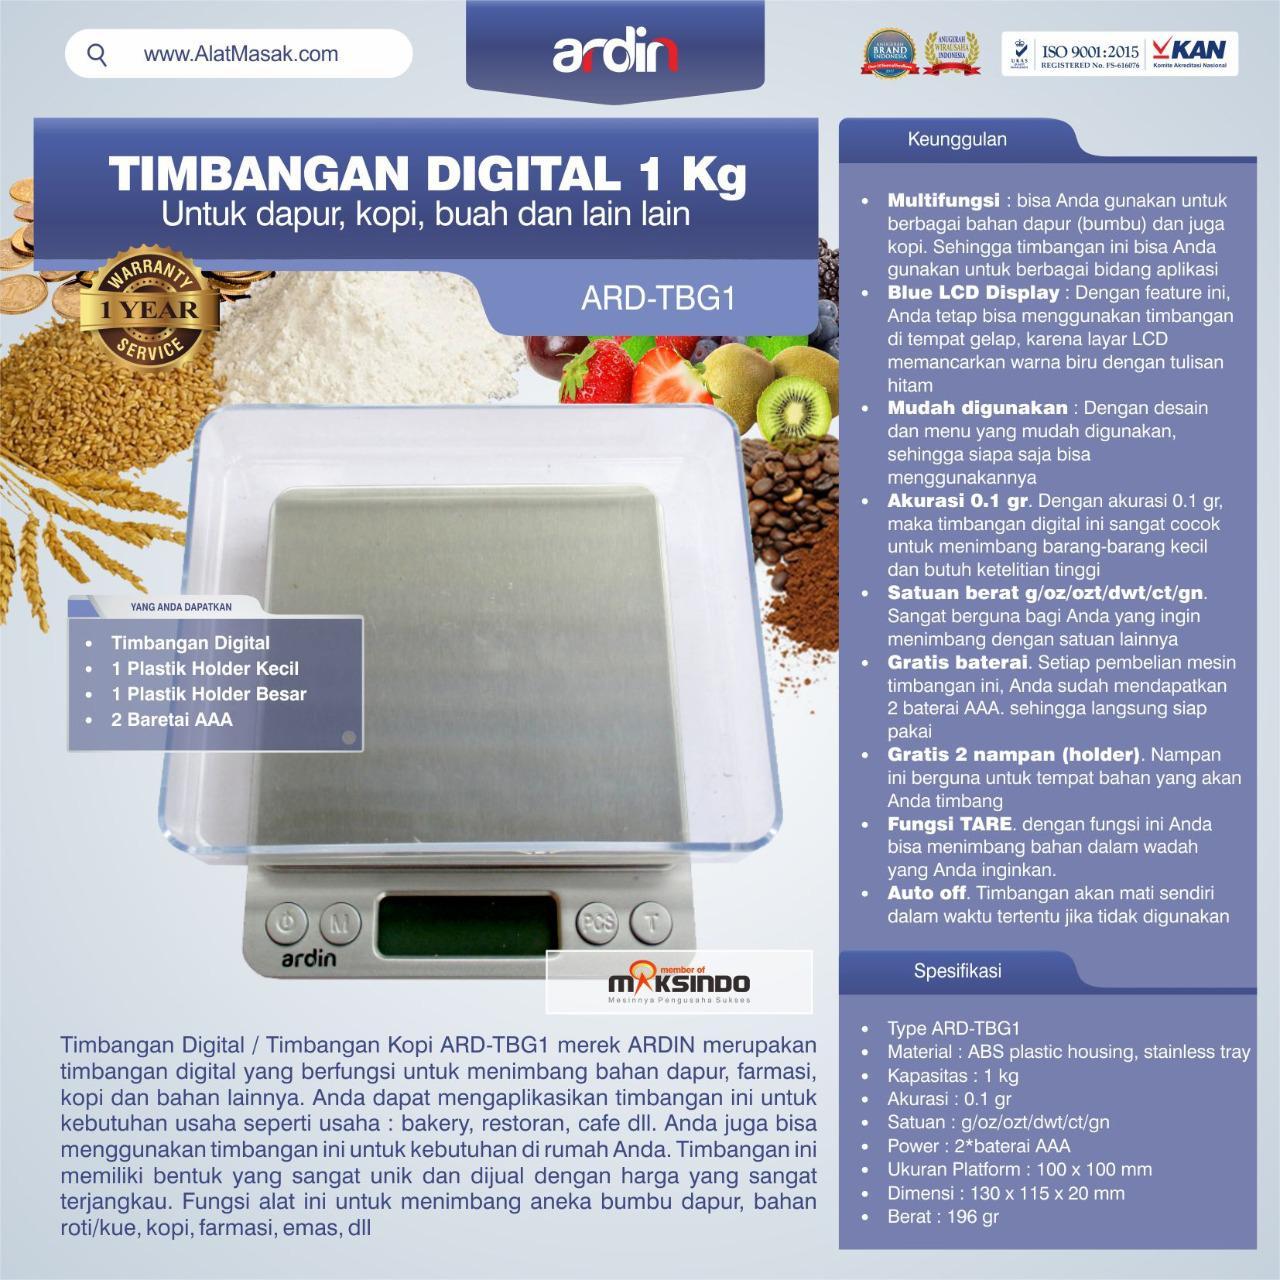 Timbangan Digital Dapur 1 kg Timbangan Kopi ARD-TBG1